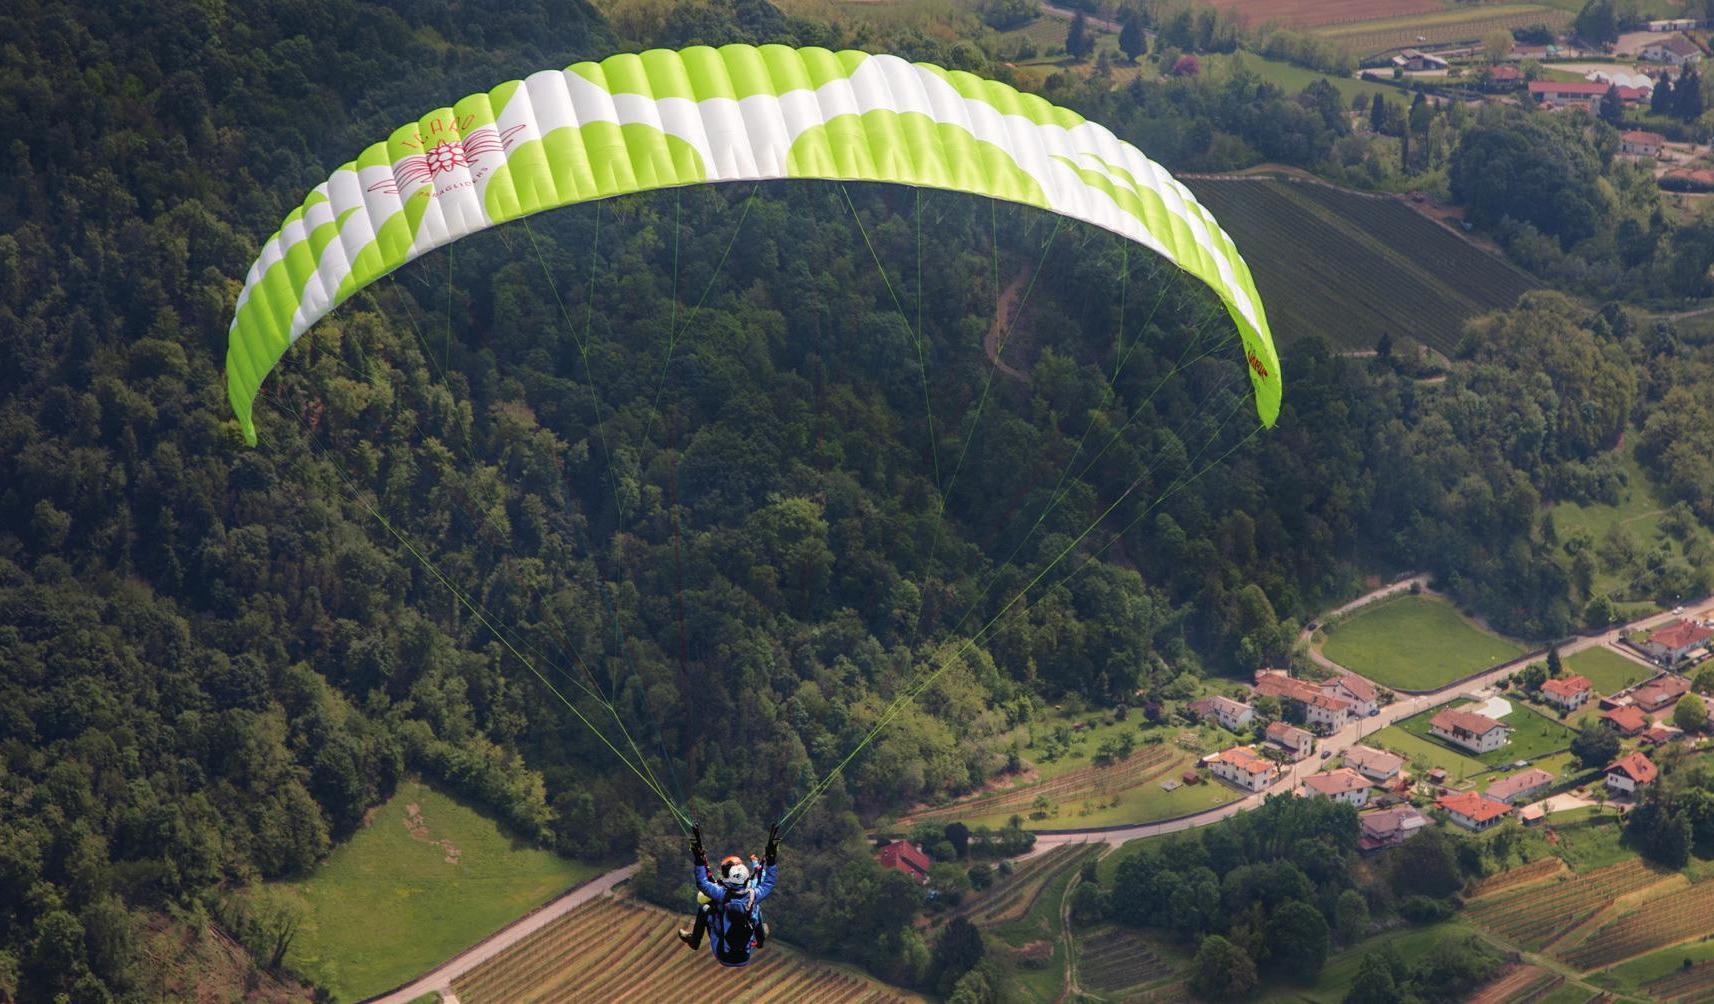 New tandem paraglider Icaro Parus 2 for sale